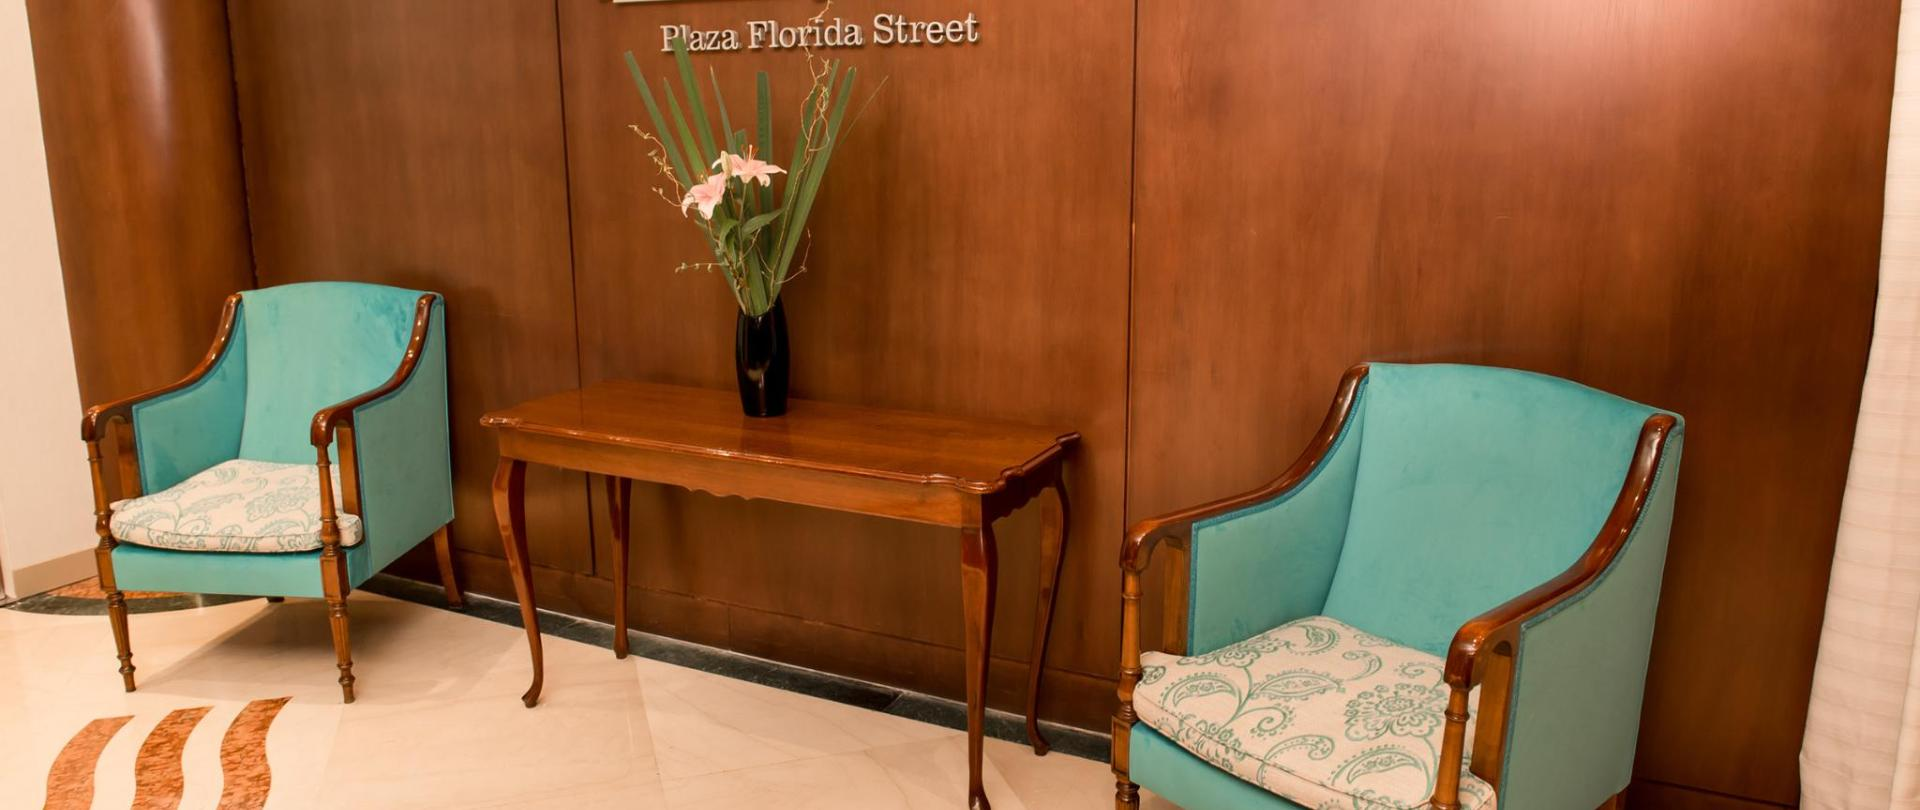 Howard Johnson Plaza Florida